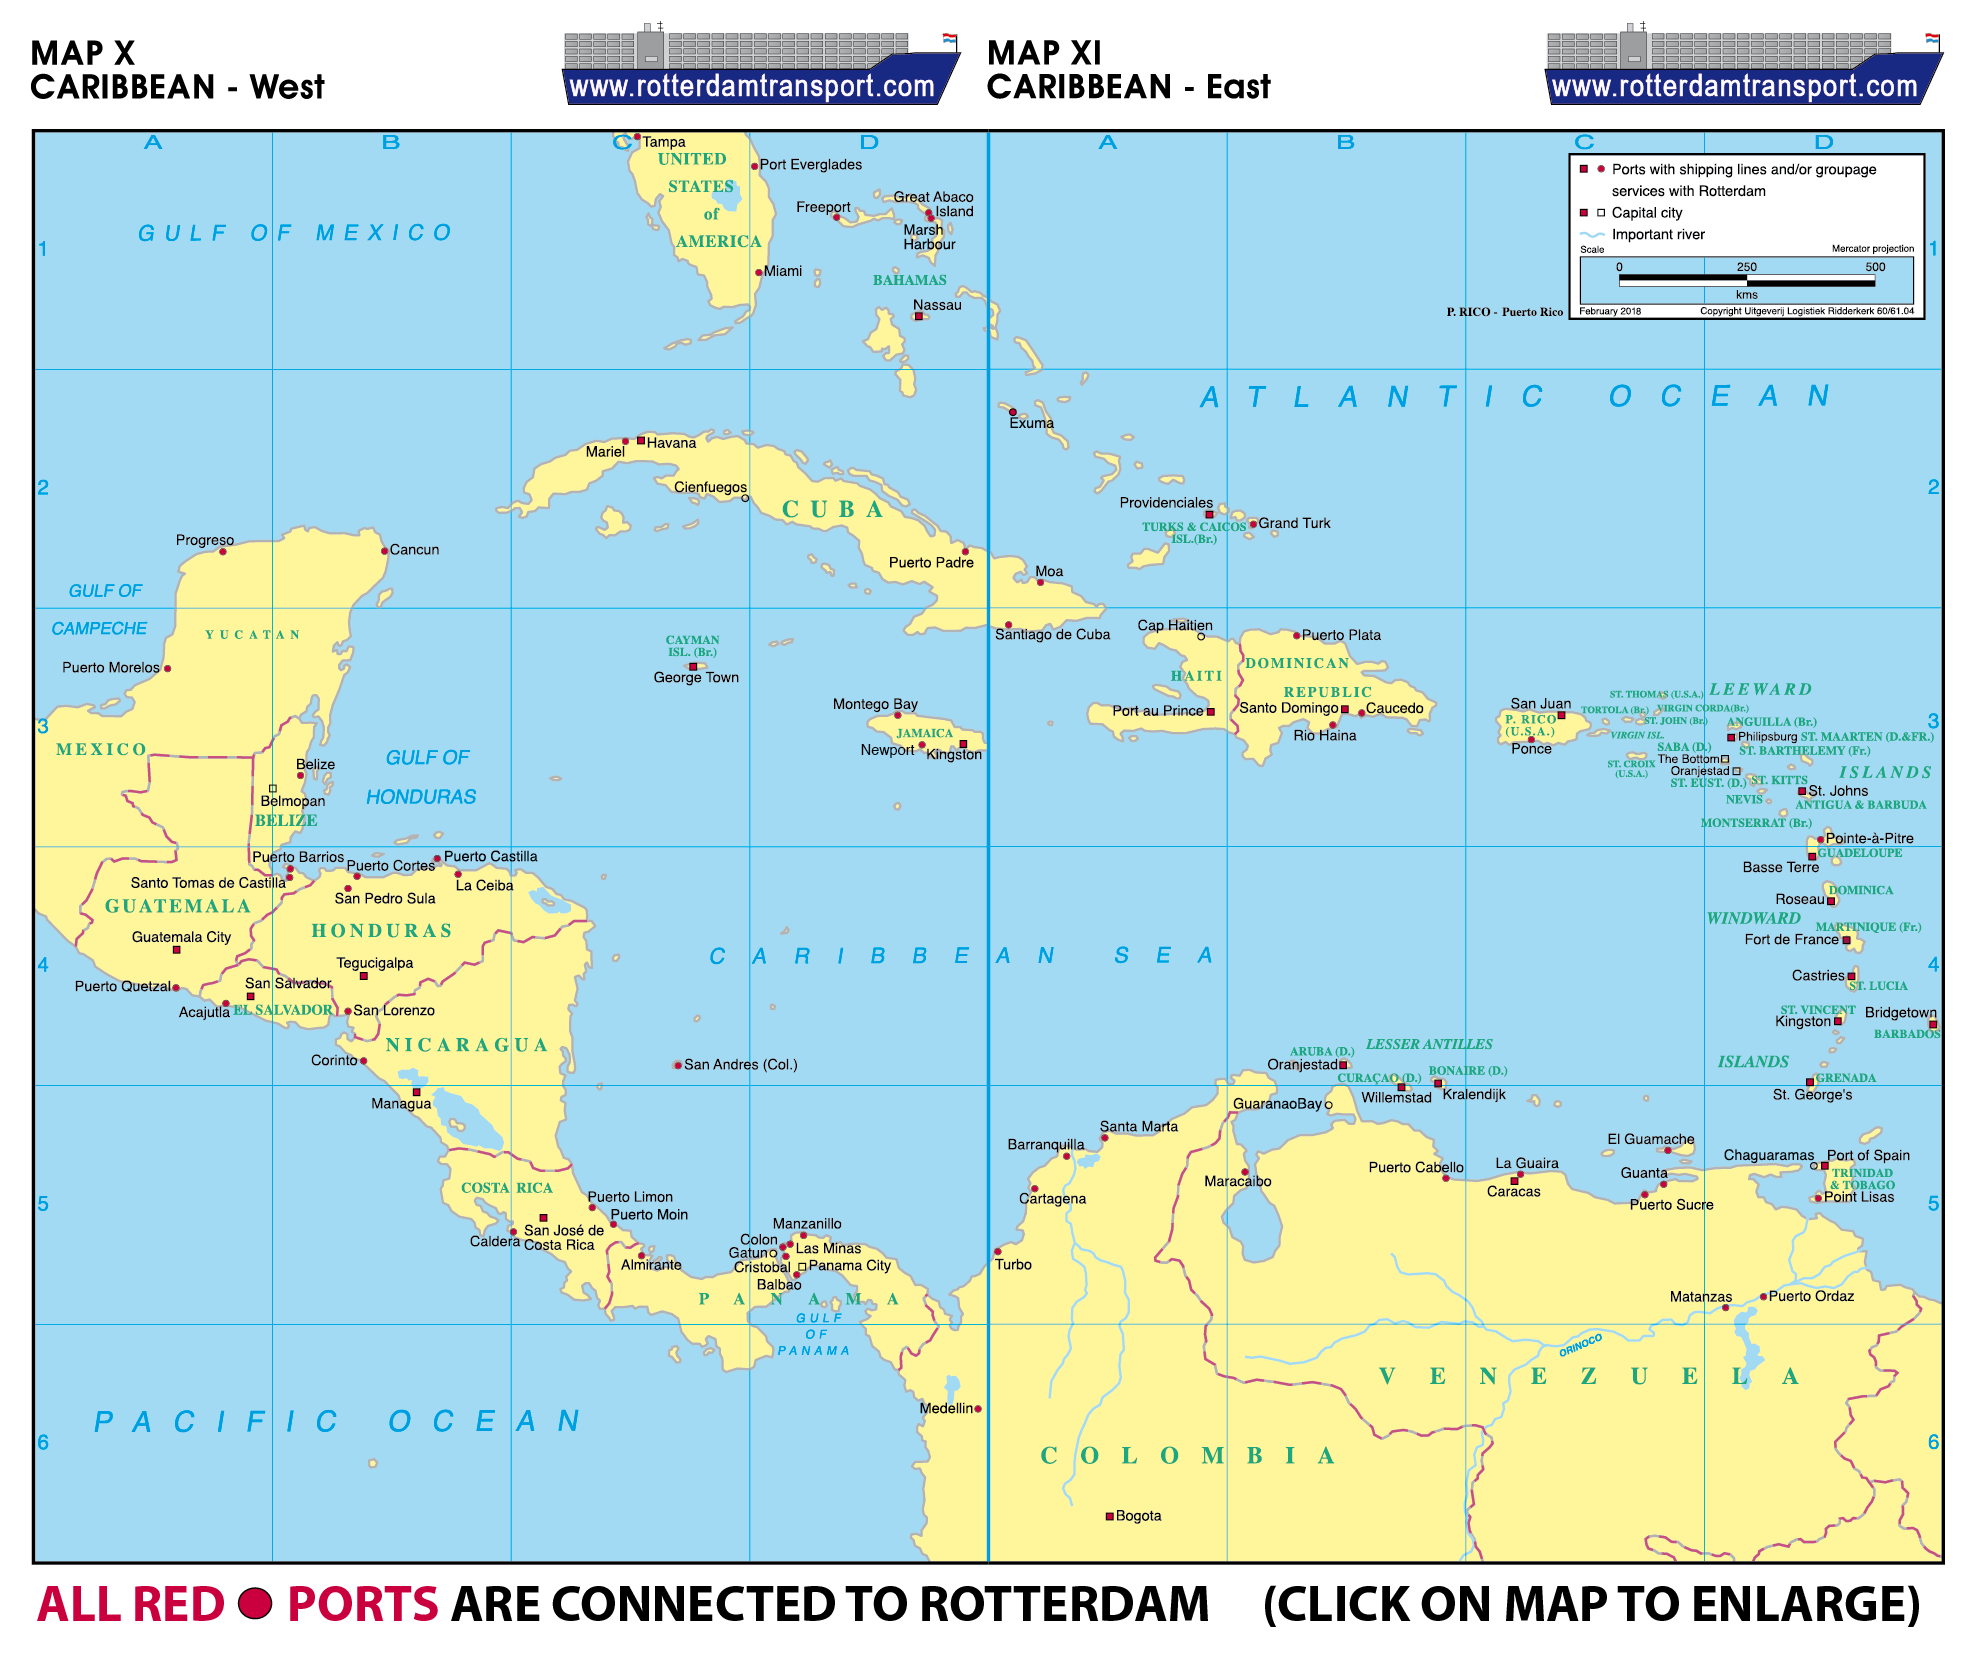 www.rotterdamtransport.com - world port maps